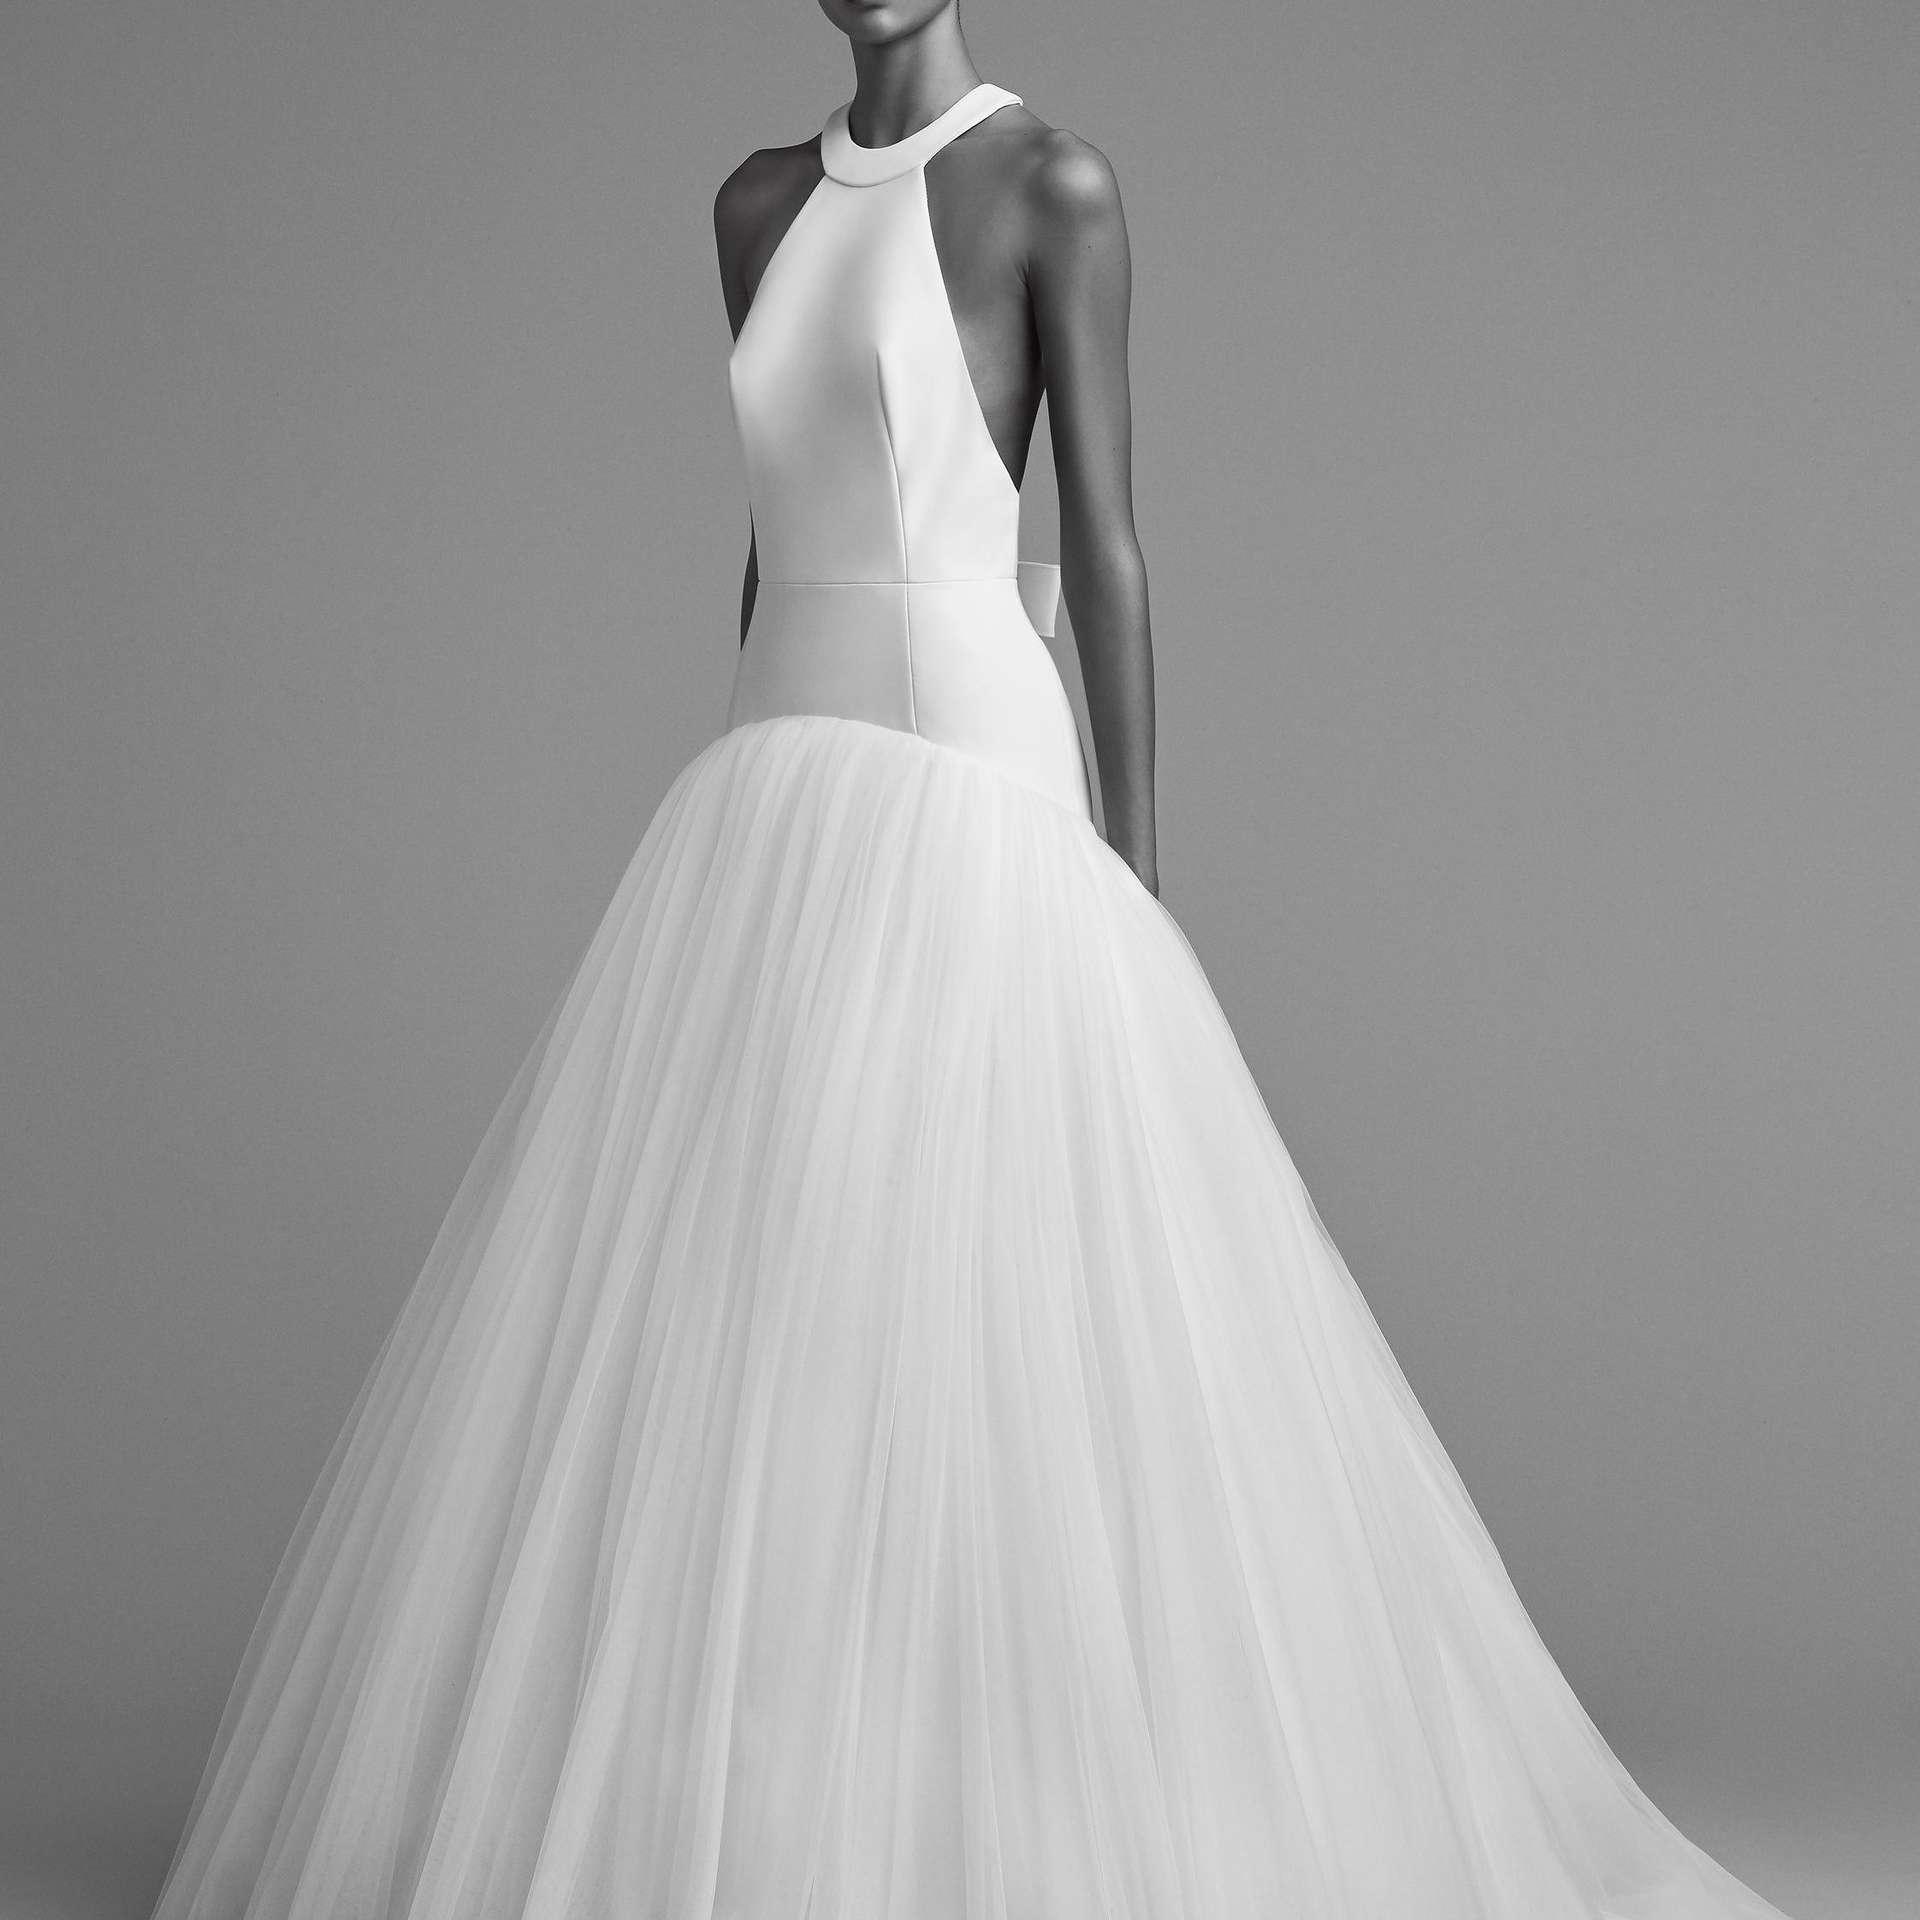 Sleeveless dramatic wedding gown